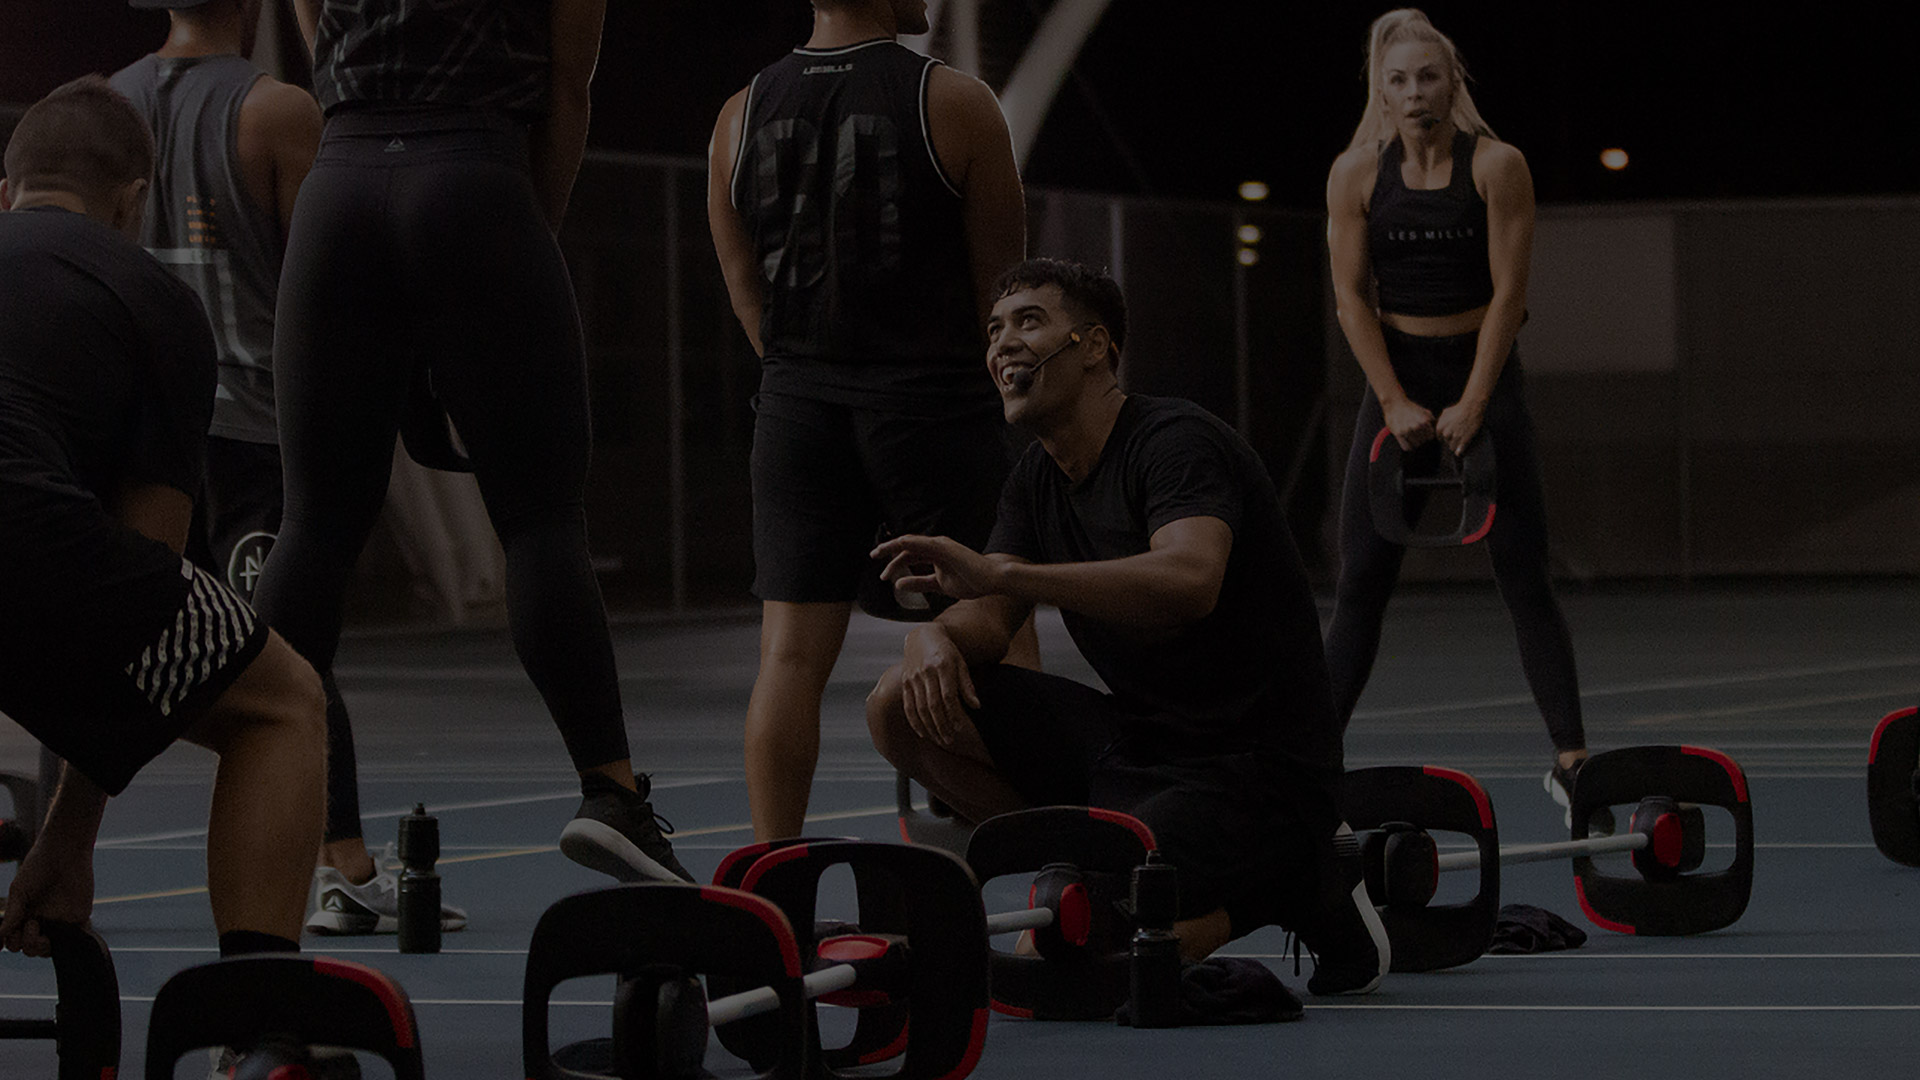 Formation GFM 30.0 (Groupe Fitness Management)